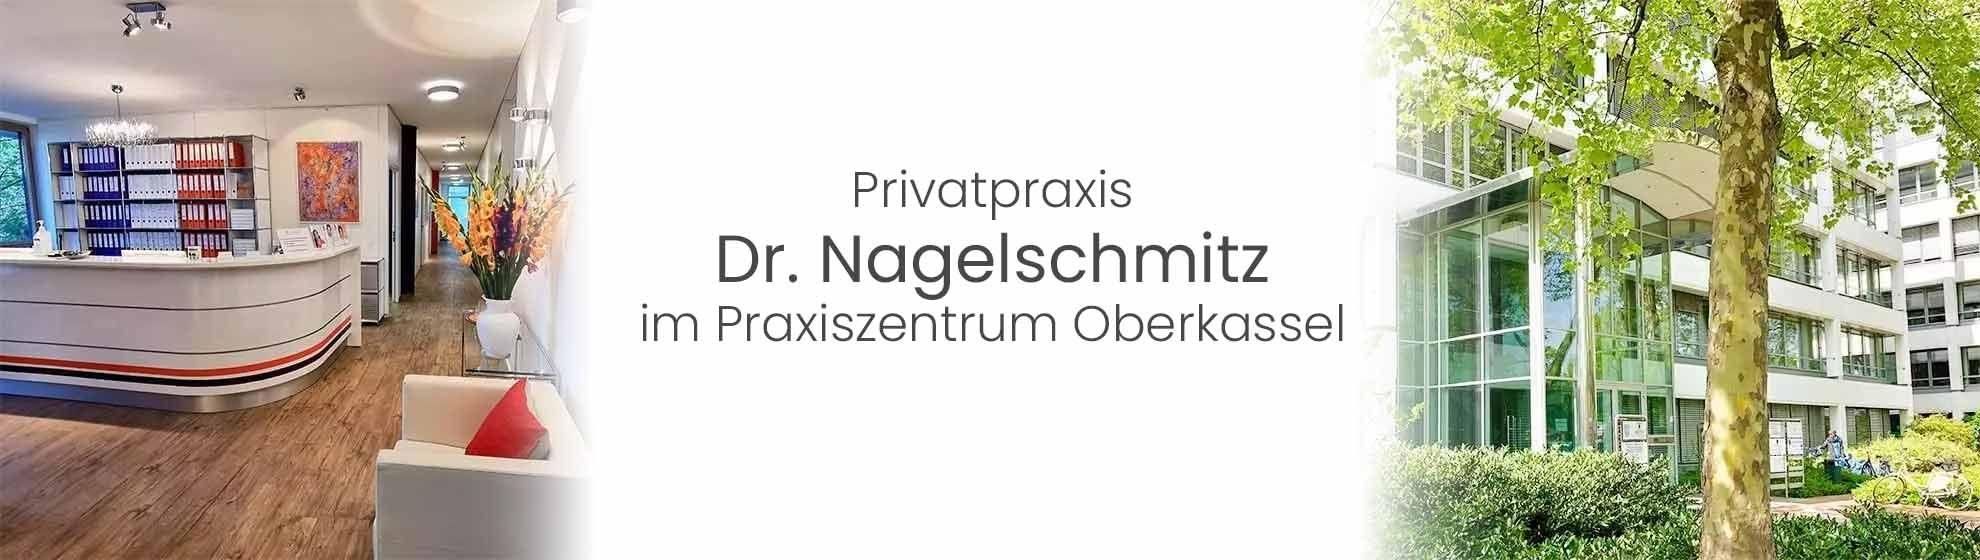 1. Earfold Zentrum Deutschland Dr. Nagelschmitz